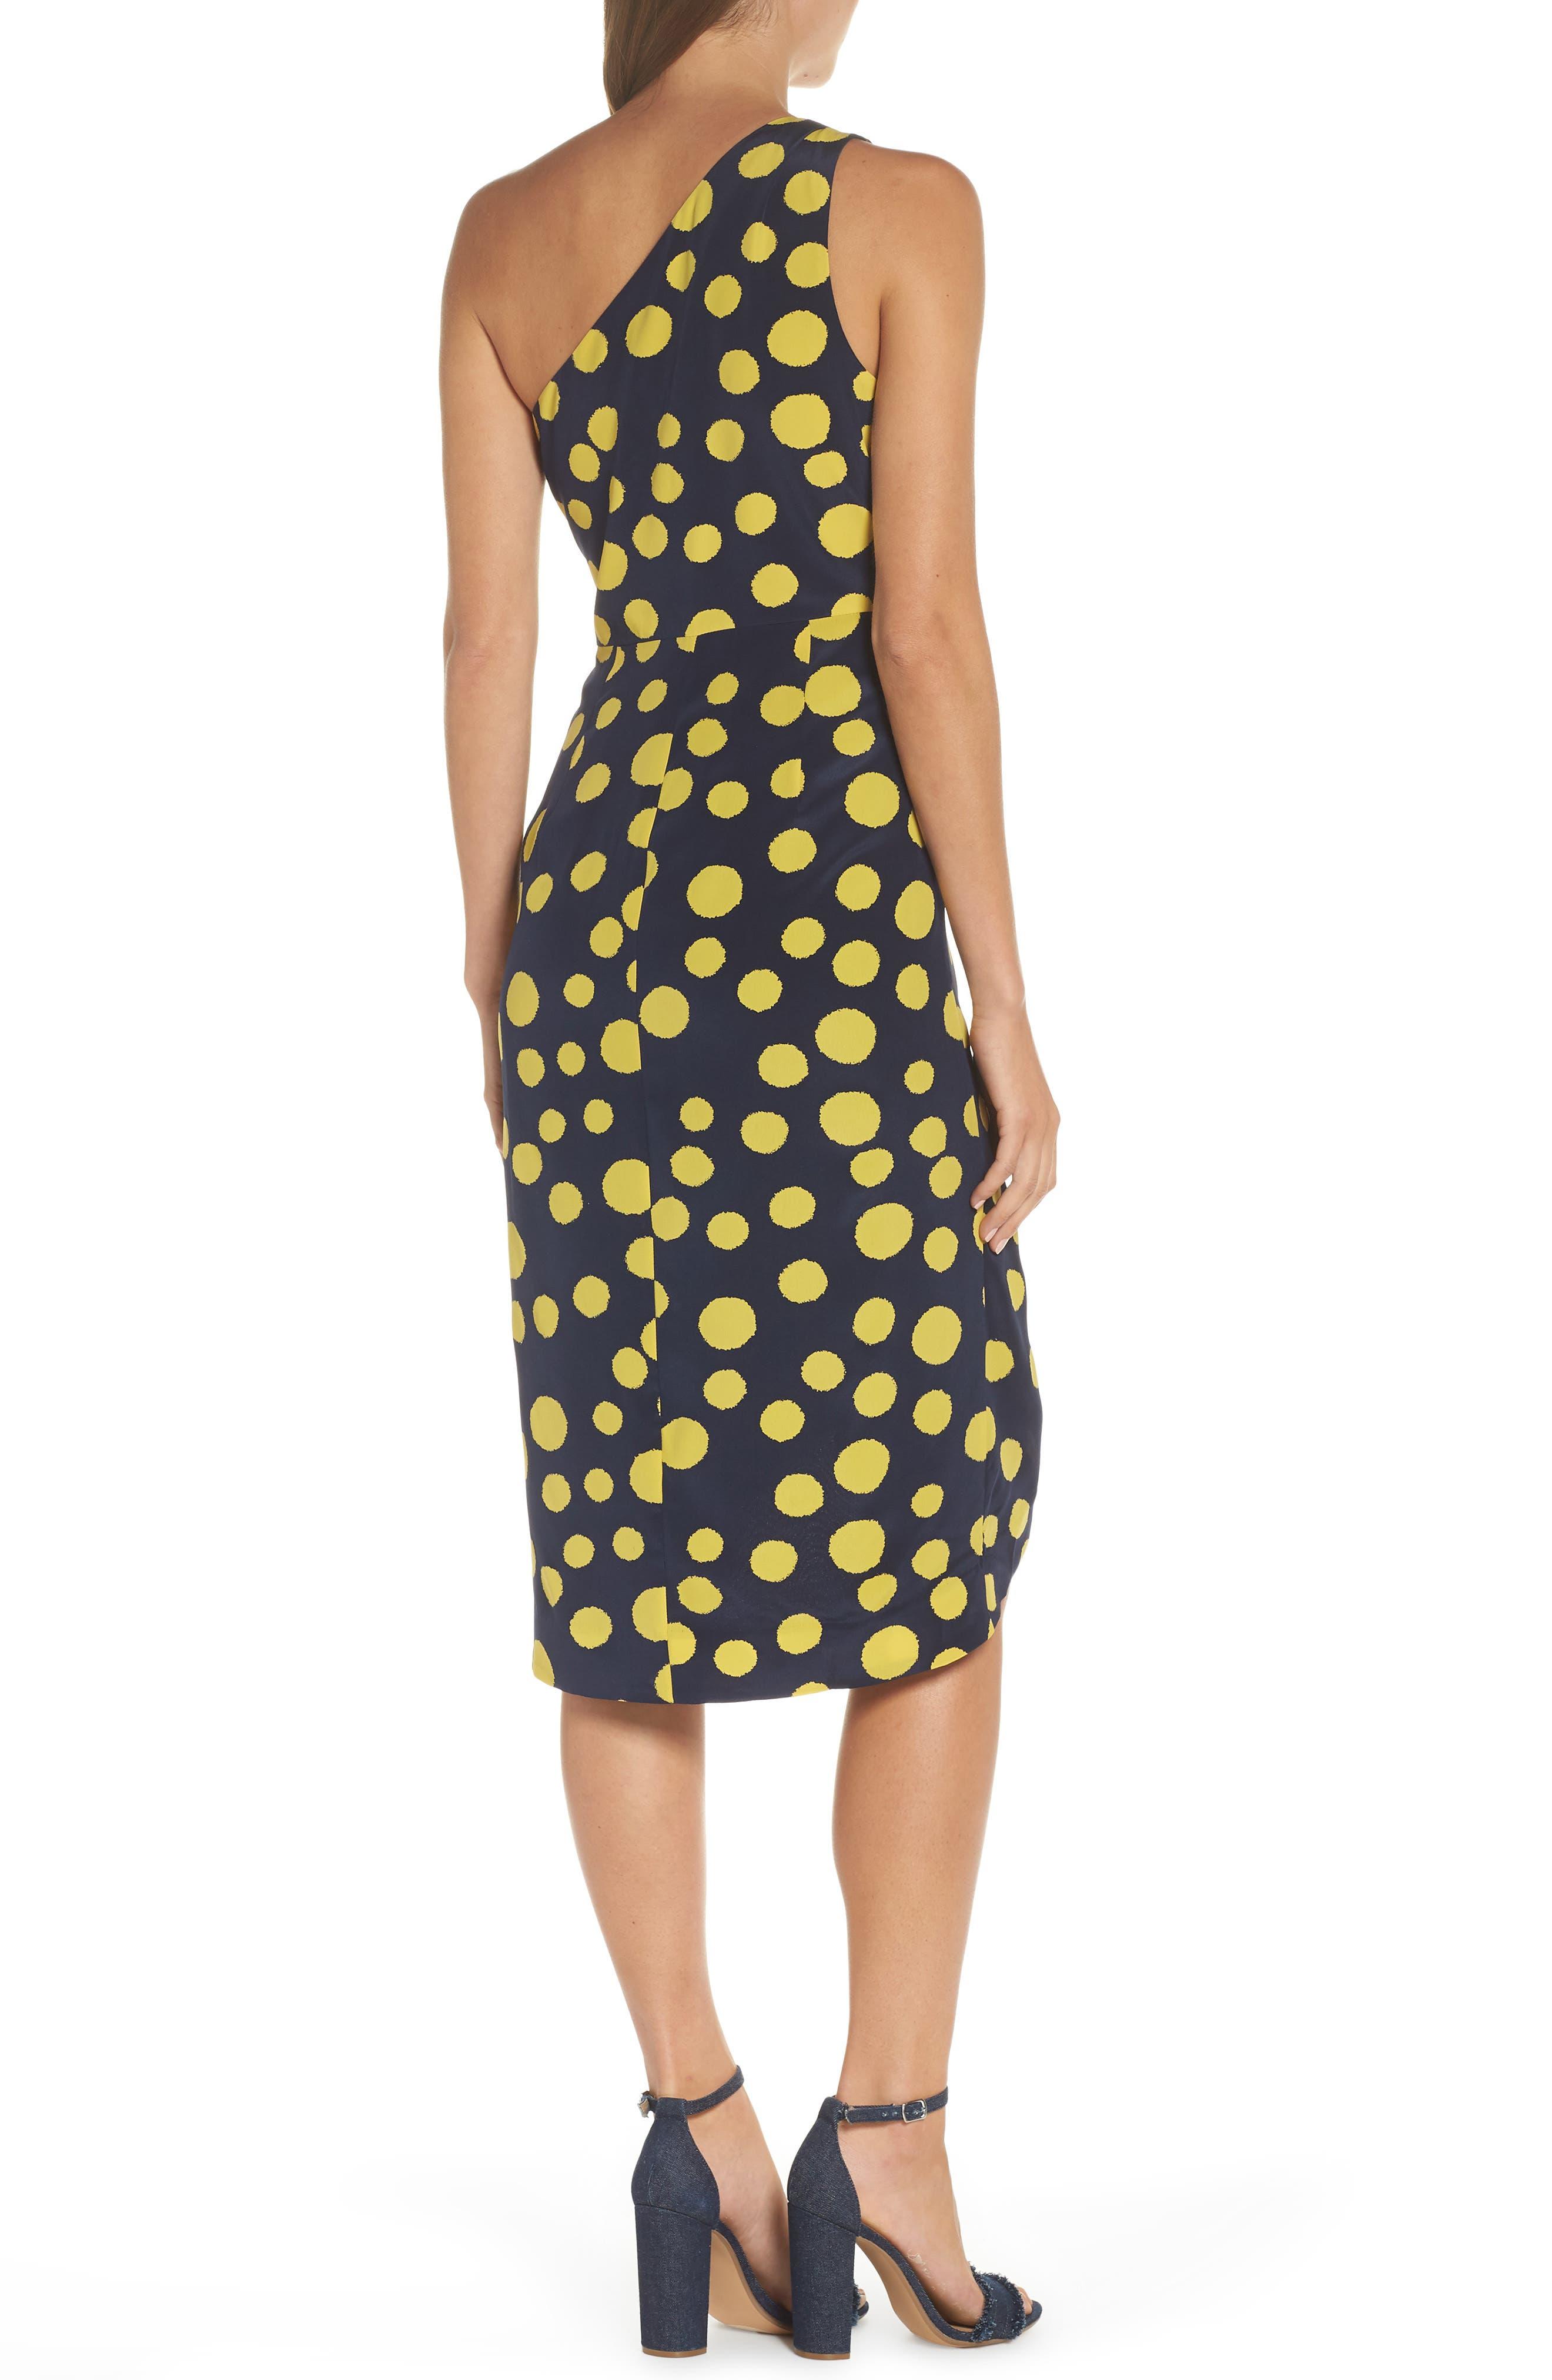 J.CREW,                             Polka Dot One-Shoulder Silk Dress,                             Alternate thumbnail 2, color,                             401